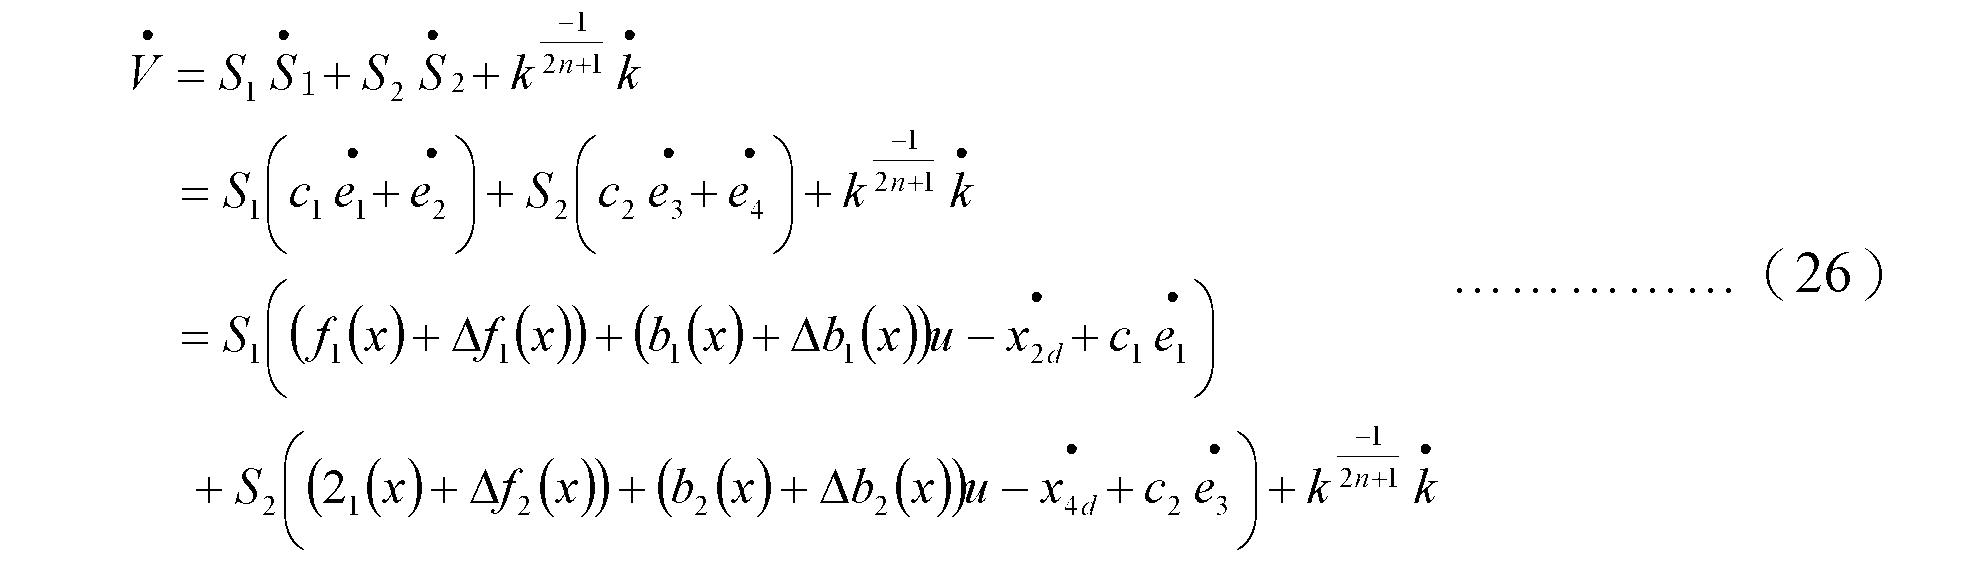 Figure 107143115-A0305-02-0012-75